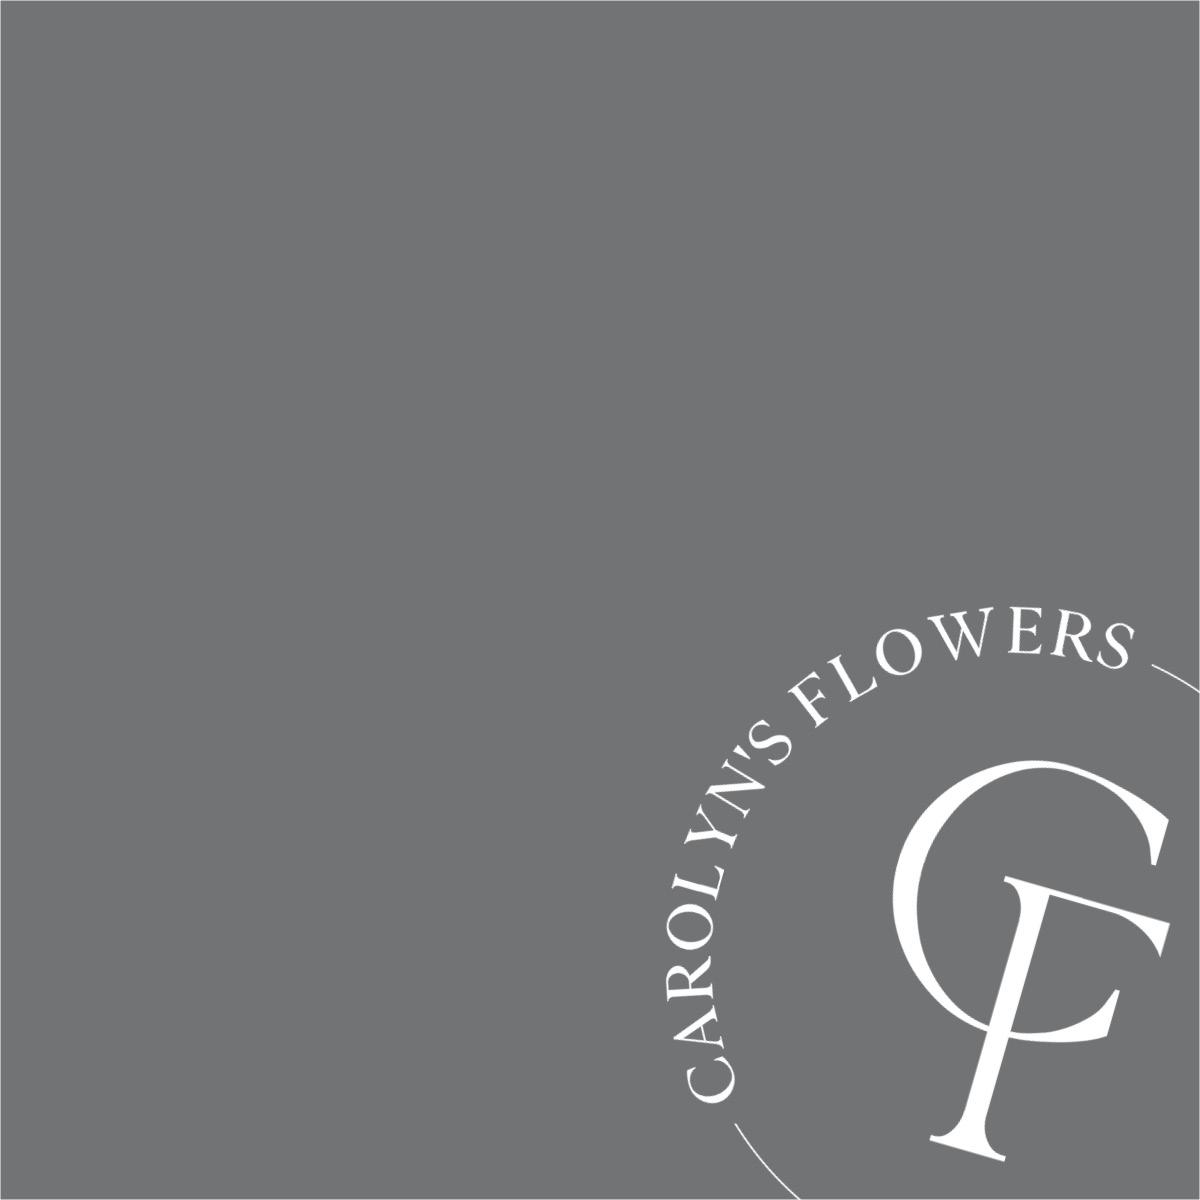 Carolyns Flowers_Main Brand_Post Five.jpg